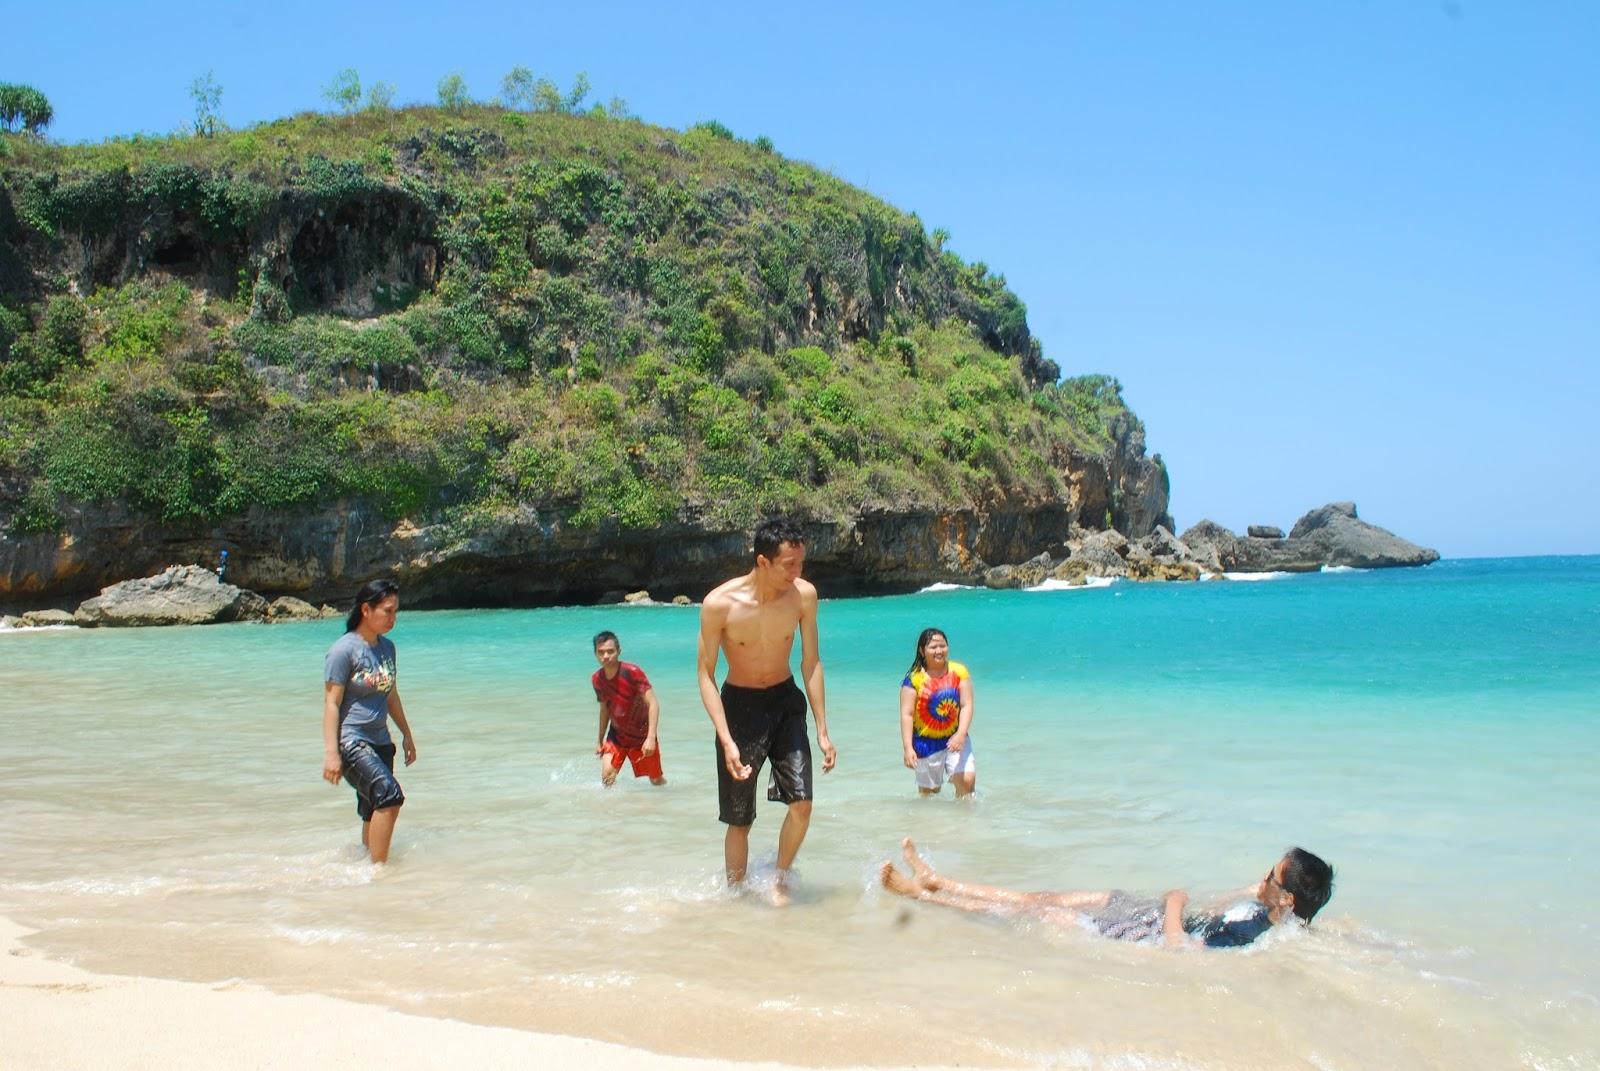 Rika Nofiani Journey Memanjakan Mata Di Pantai Ngrenehan